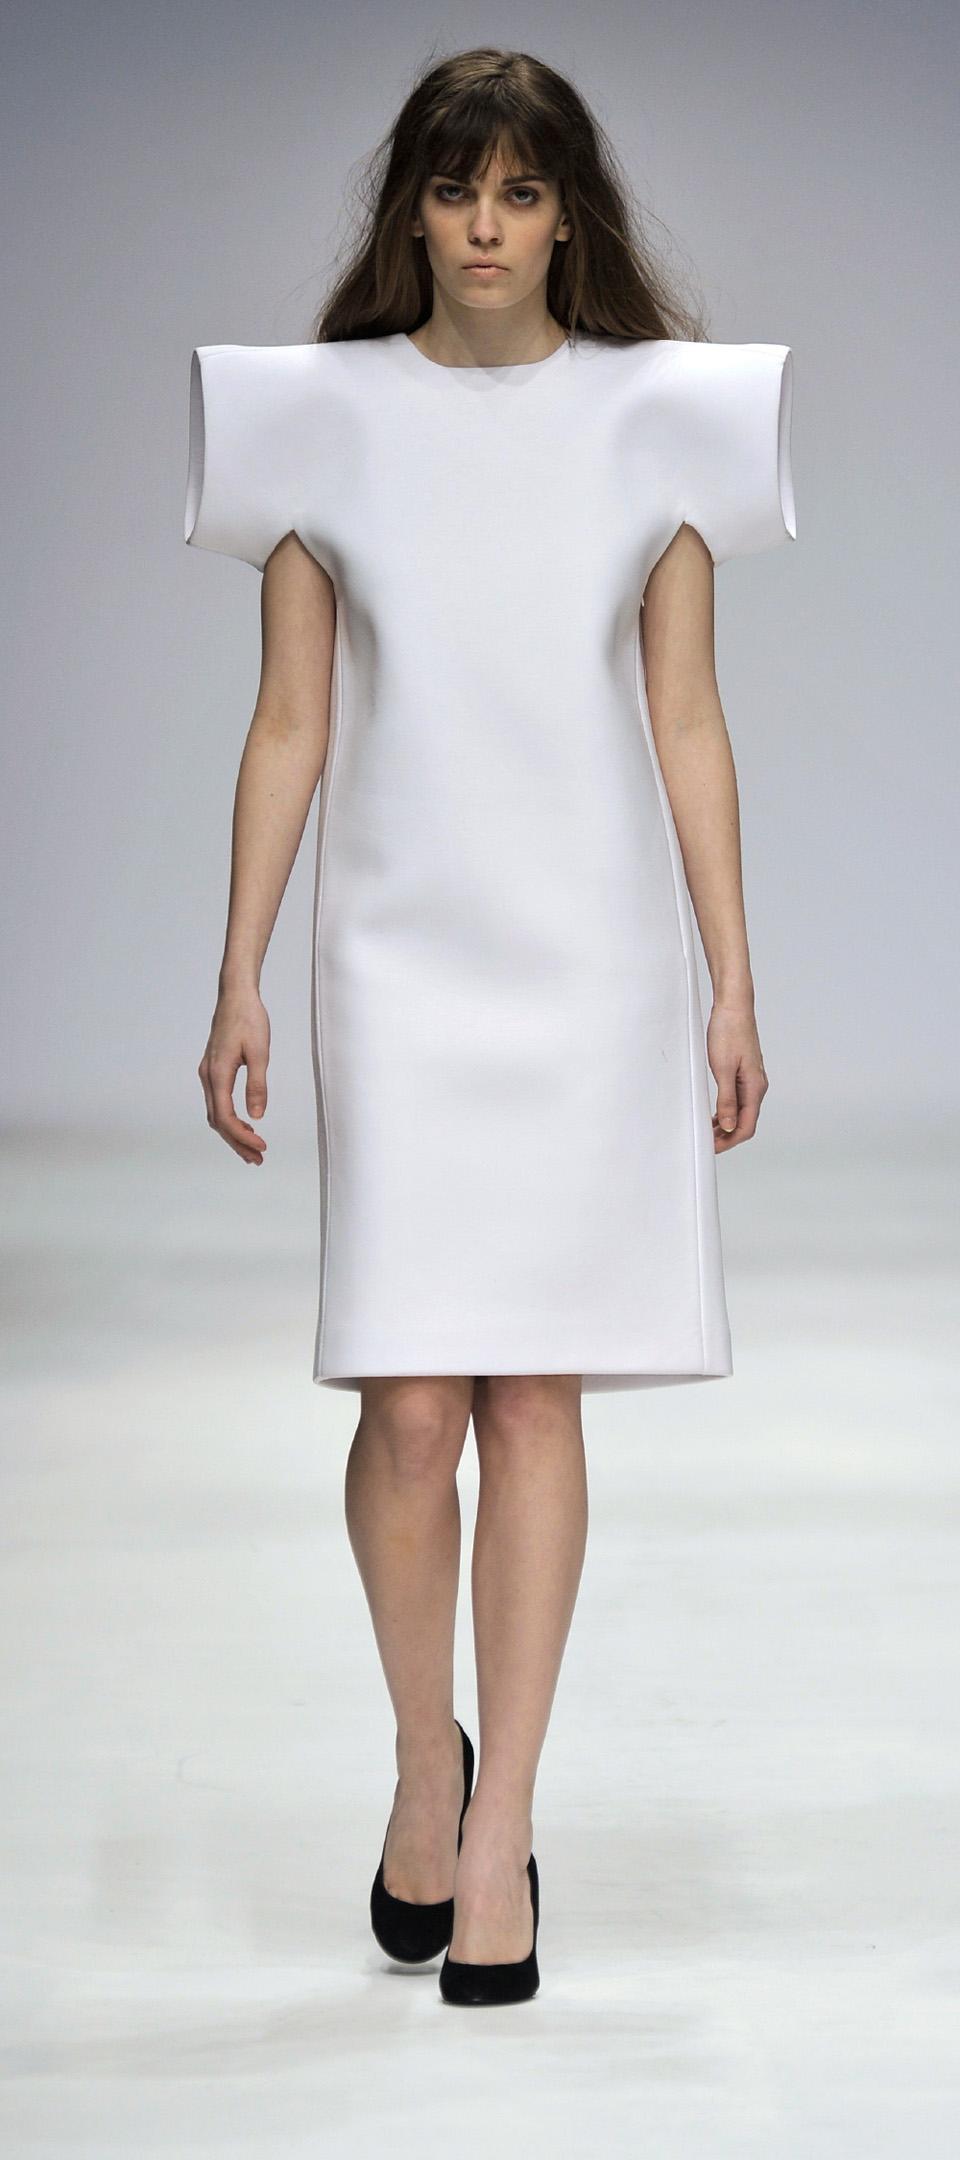 Qiu hao fashion designer 79